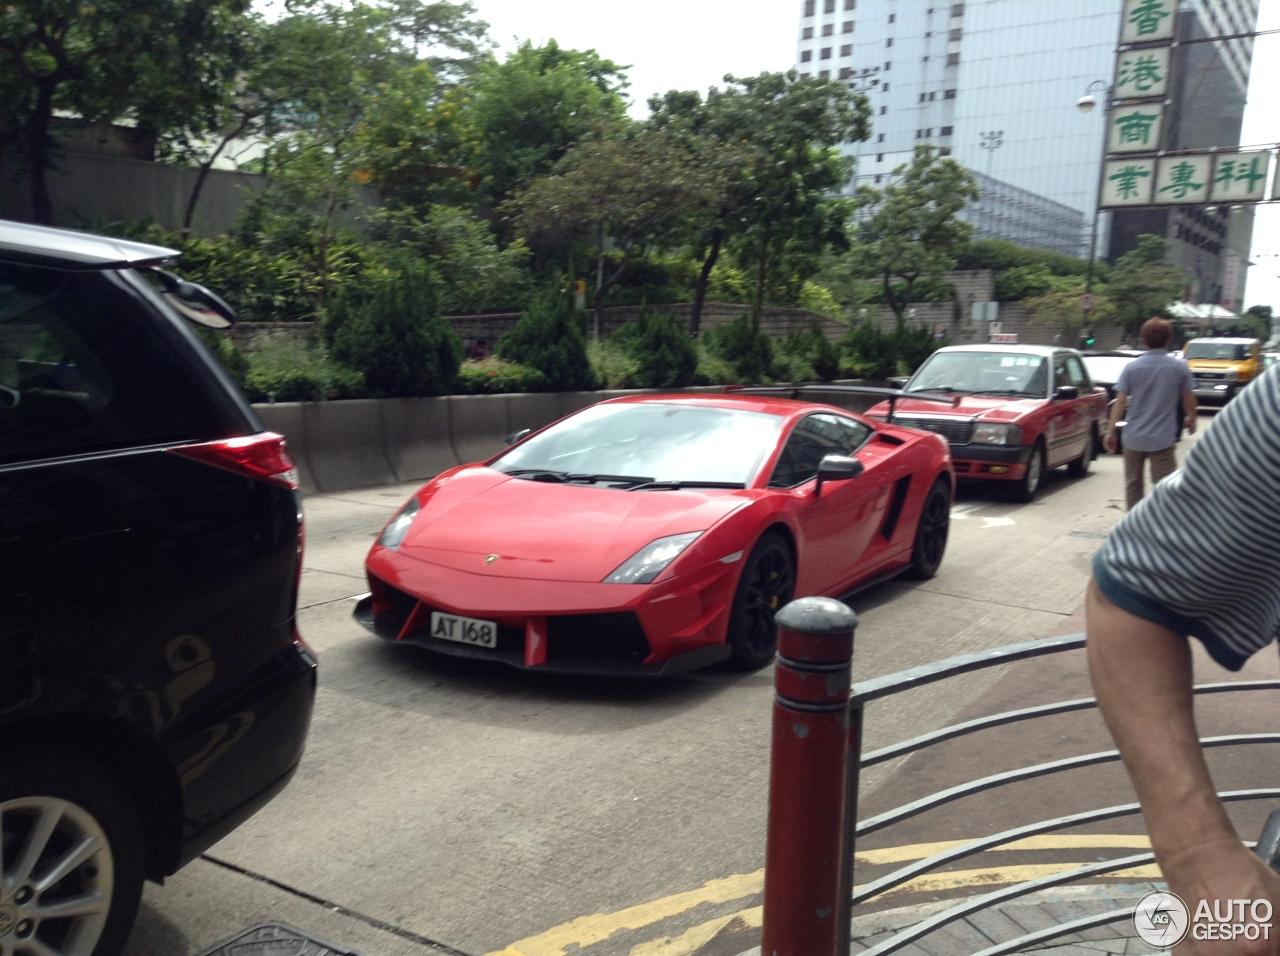 Lamborghini Gallardo Lp570 4 Super Trofeo Stradale 21 June 2015